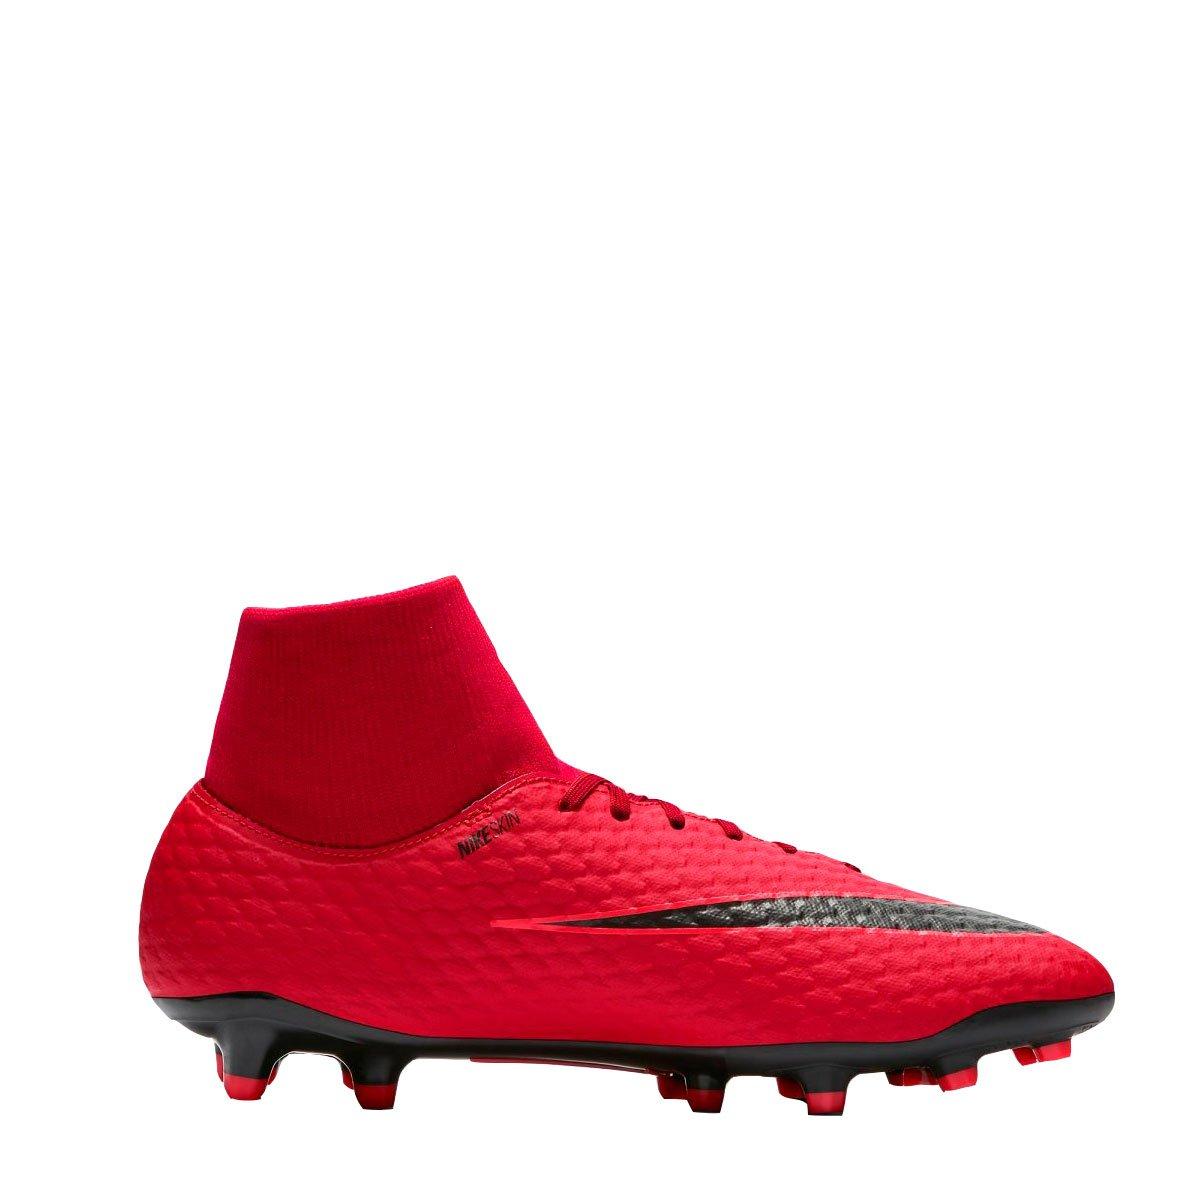 Bizz Store - Chuteira Campo Nike Hypervenom Phelon III DF FG 2d7bc44cd3944